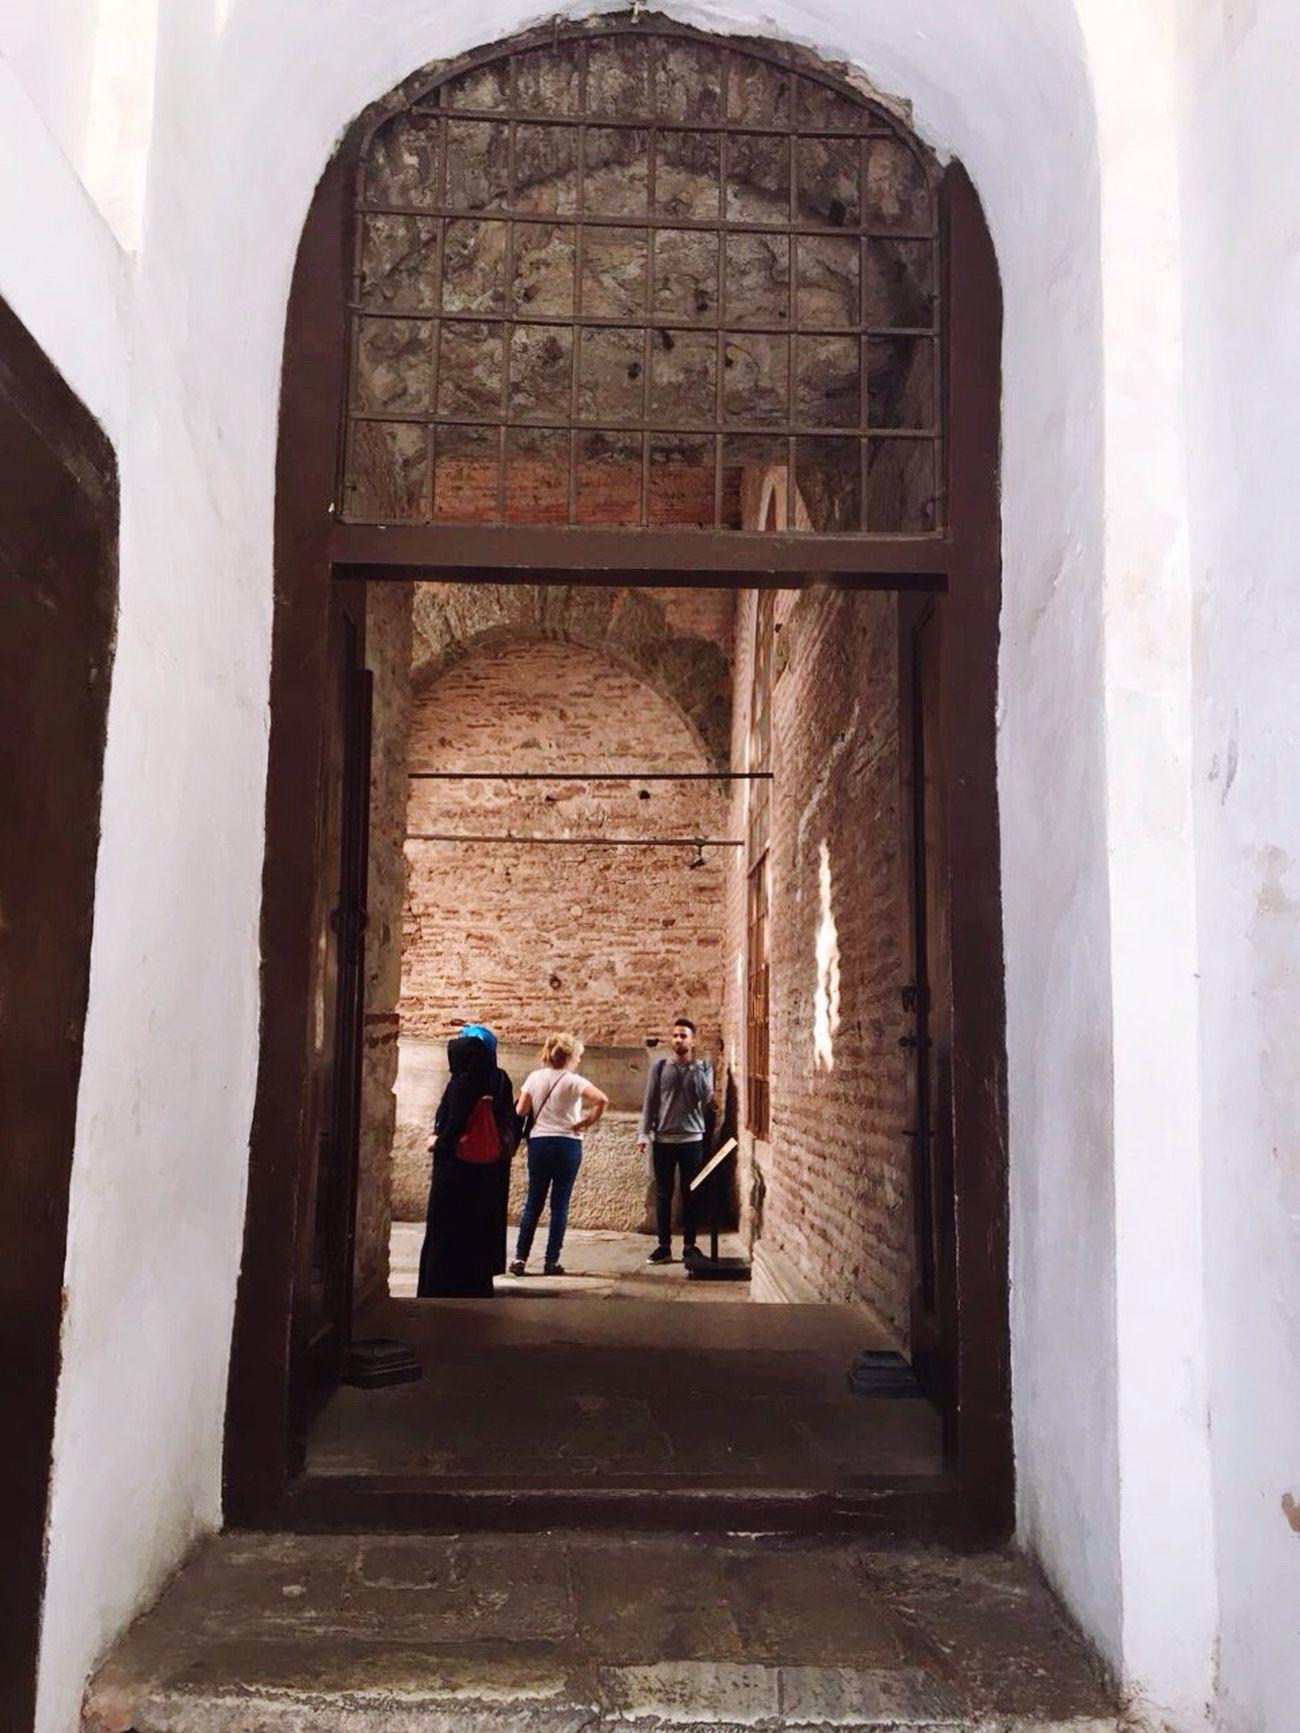 Architecture Day Arch History Hagiasophia  Travel Ayasofya (Hagia Sophia) Sultanahmet Tarihieser Tarihimekan Eminönü Istanbul Tarihiyarimada